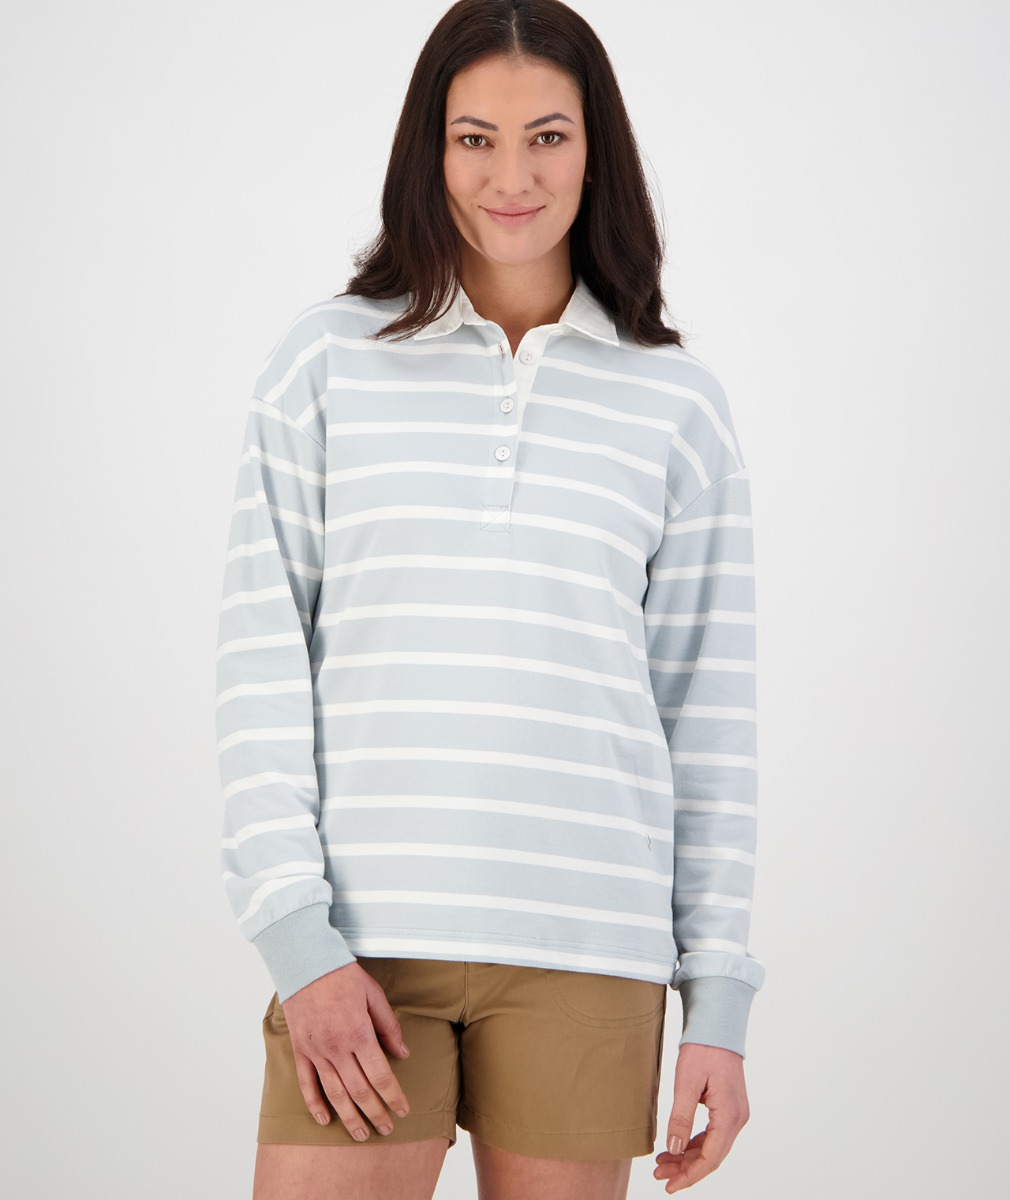 Swanndri Women's Tribeca Long Sleeve Rugby Shirt in Grey/White